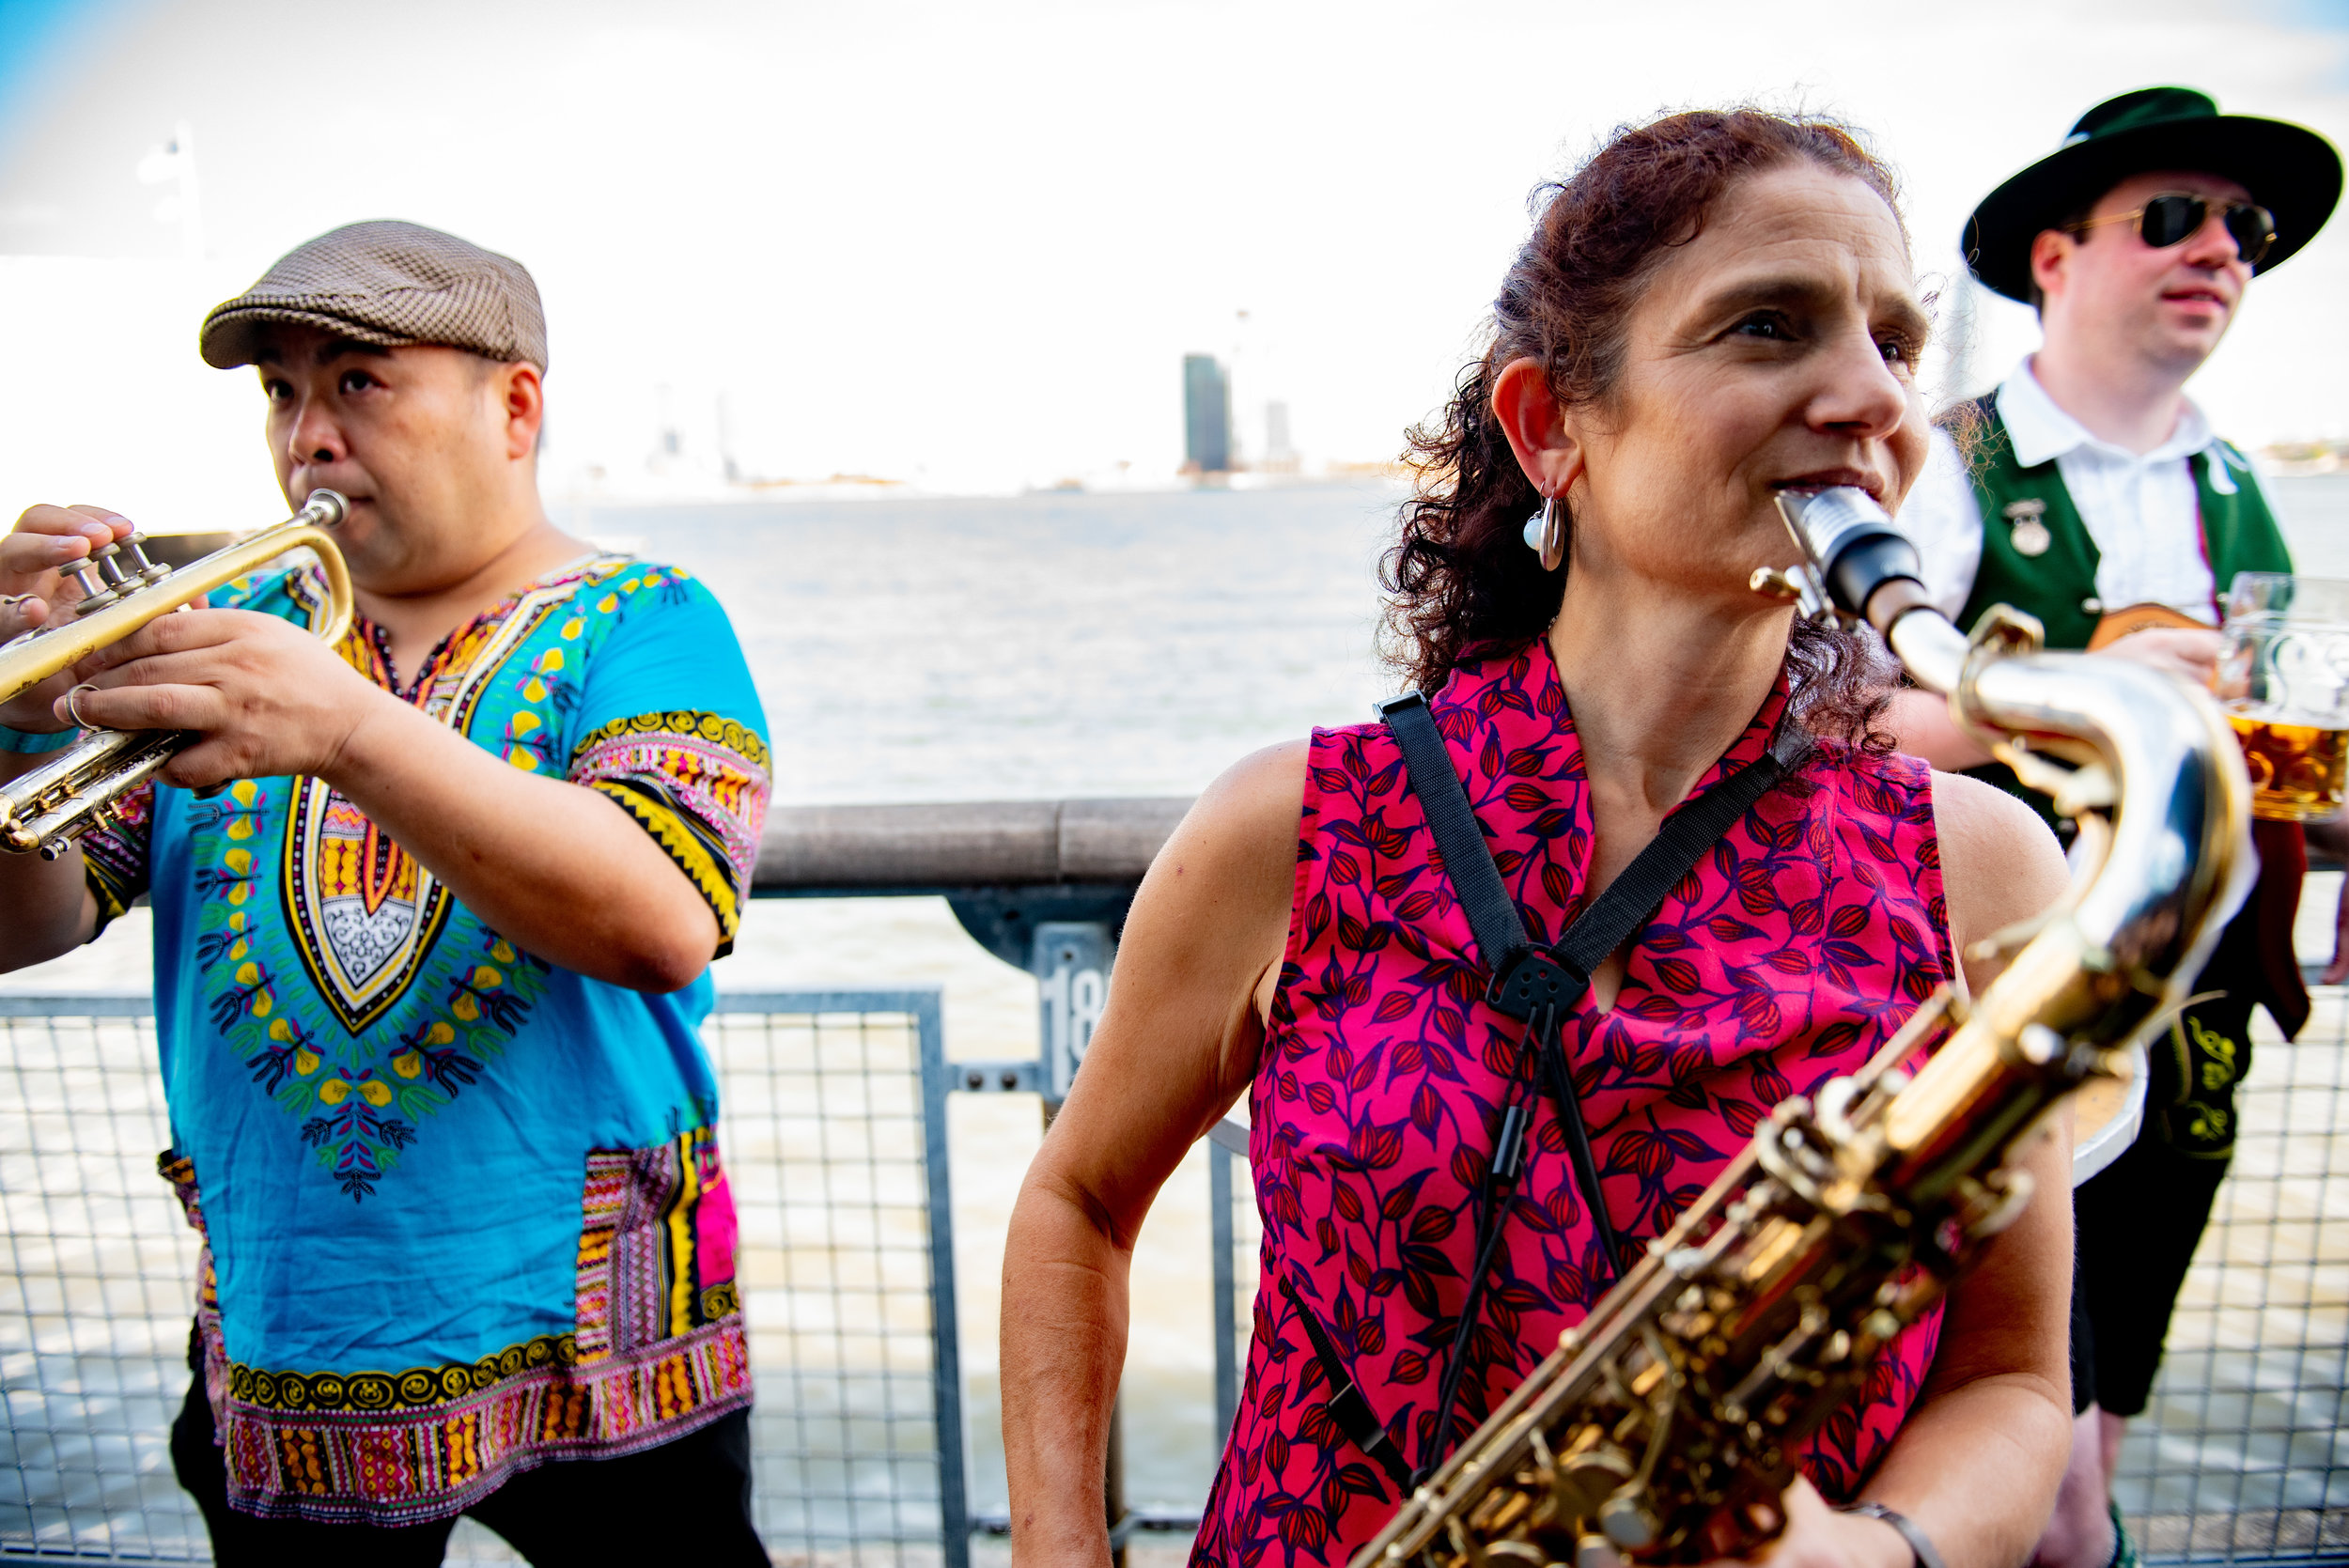 jonathan-mcphail-photography-brooklyn-new-york-nyc-event-events-photographer-4310.jpg